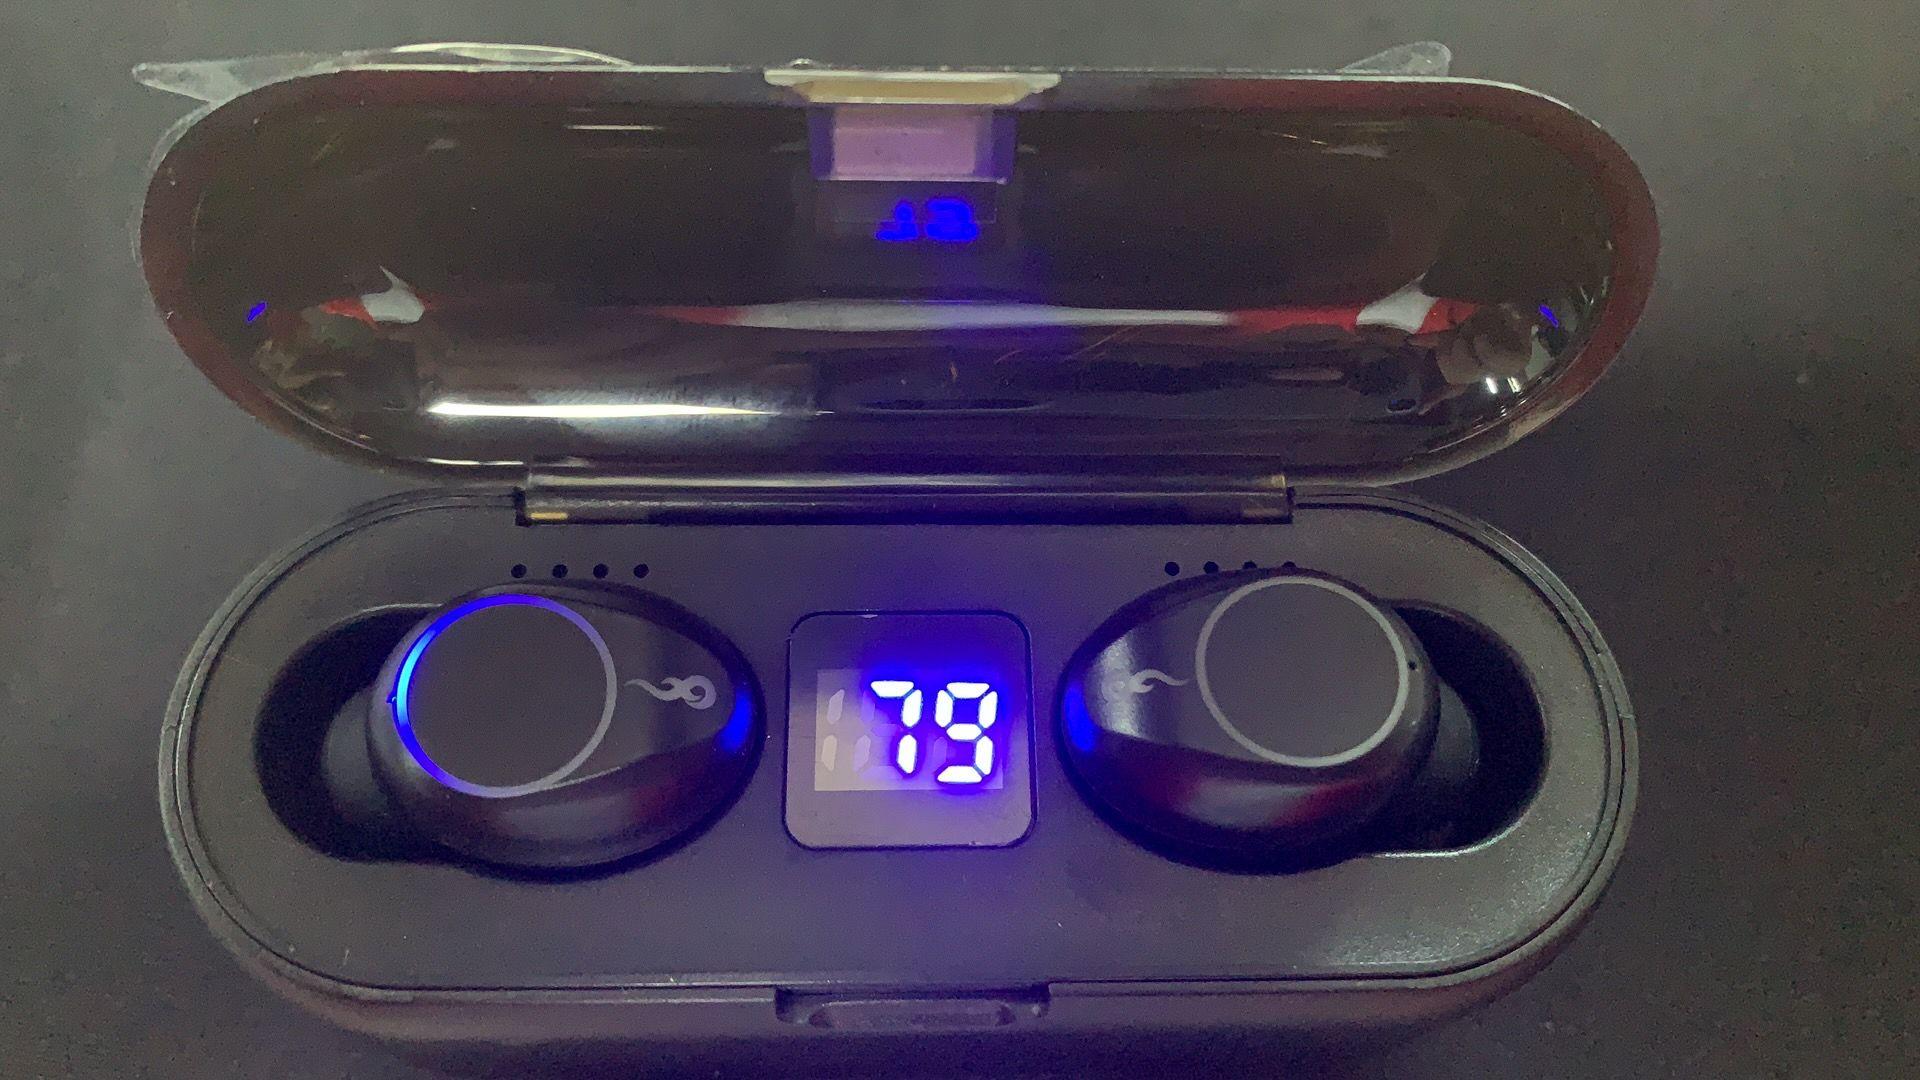 Heißer Verkauf Mini Headset Tws Wireless Bluetooth 5.0 Berührungssteuerung mit Smart Sensor F9-Kopfhörer